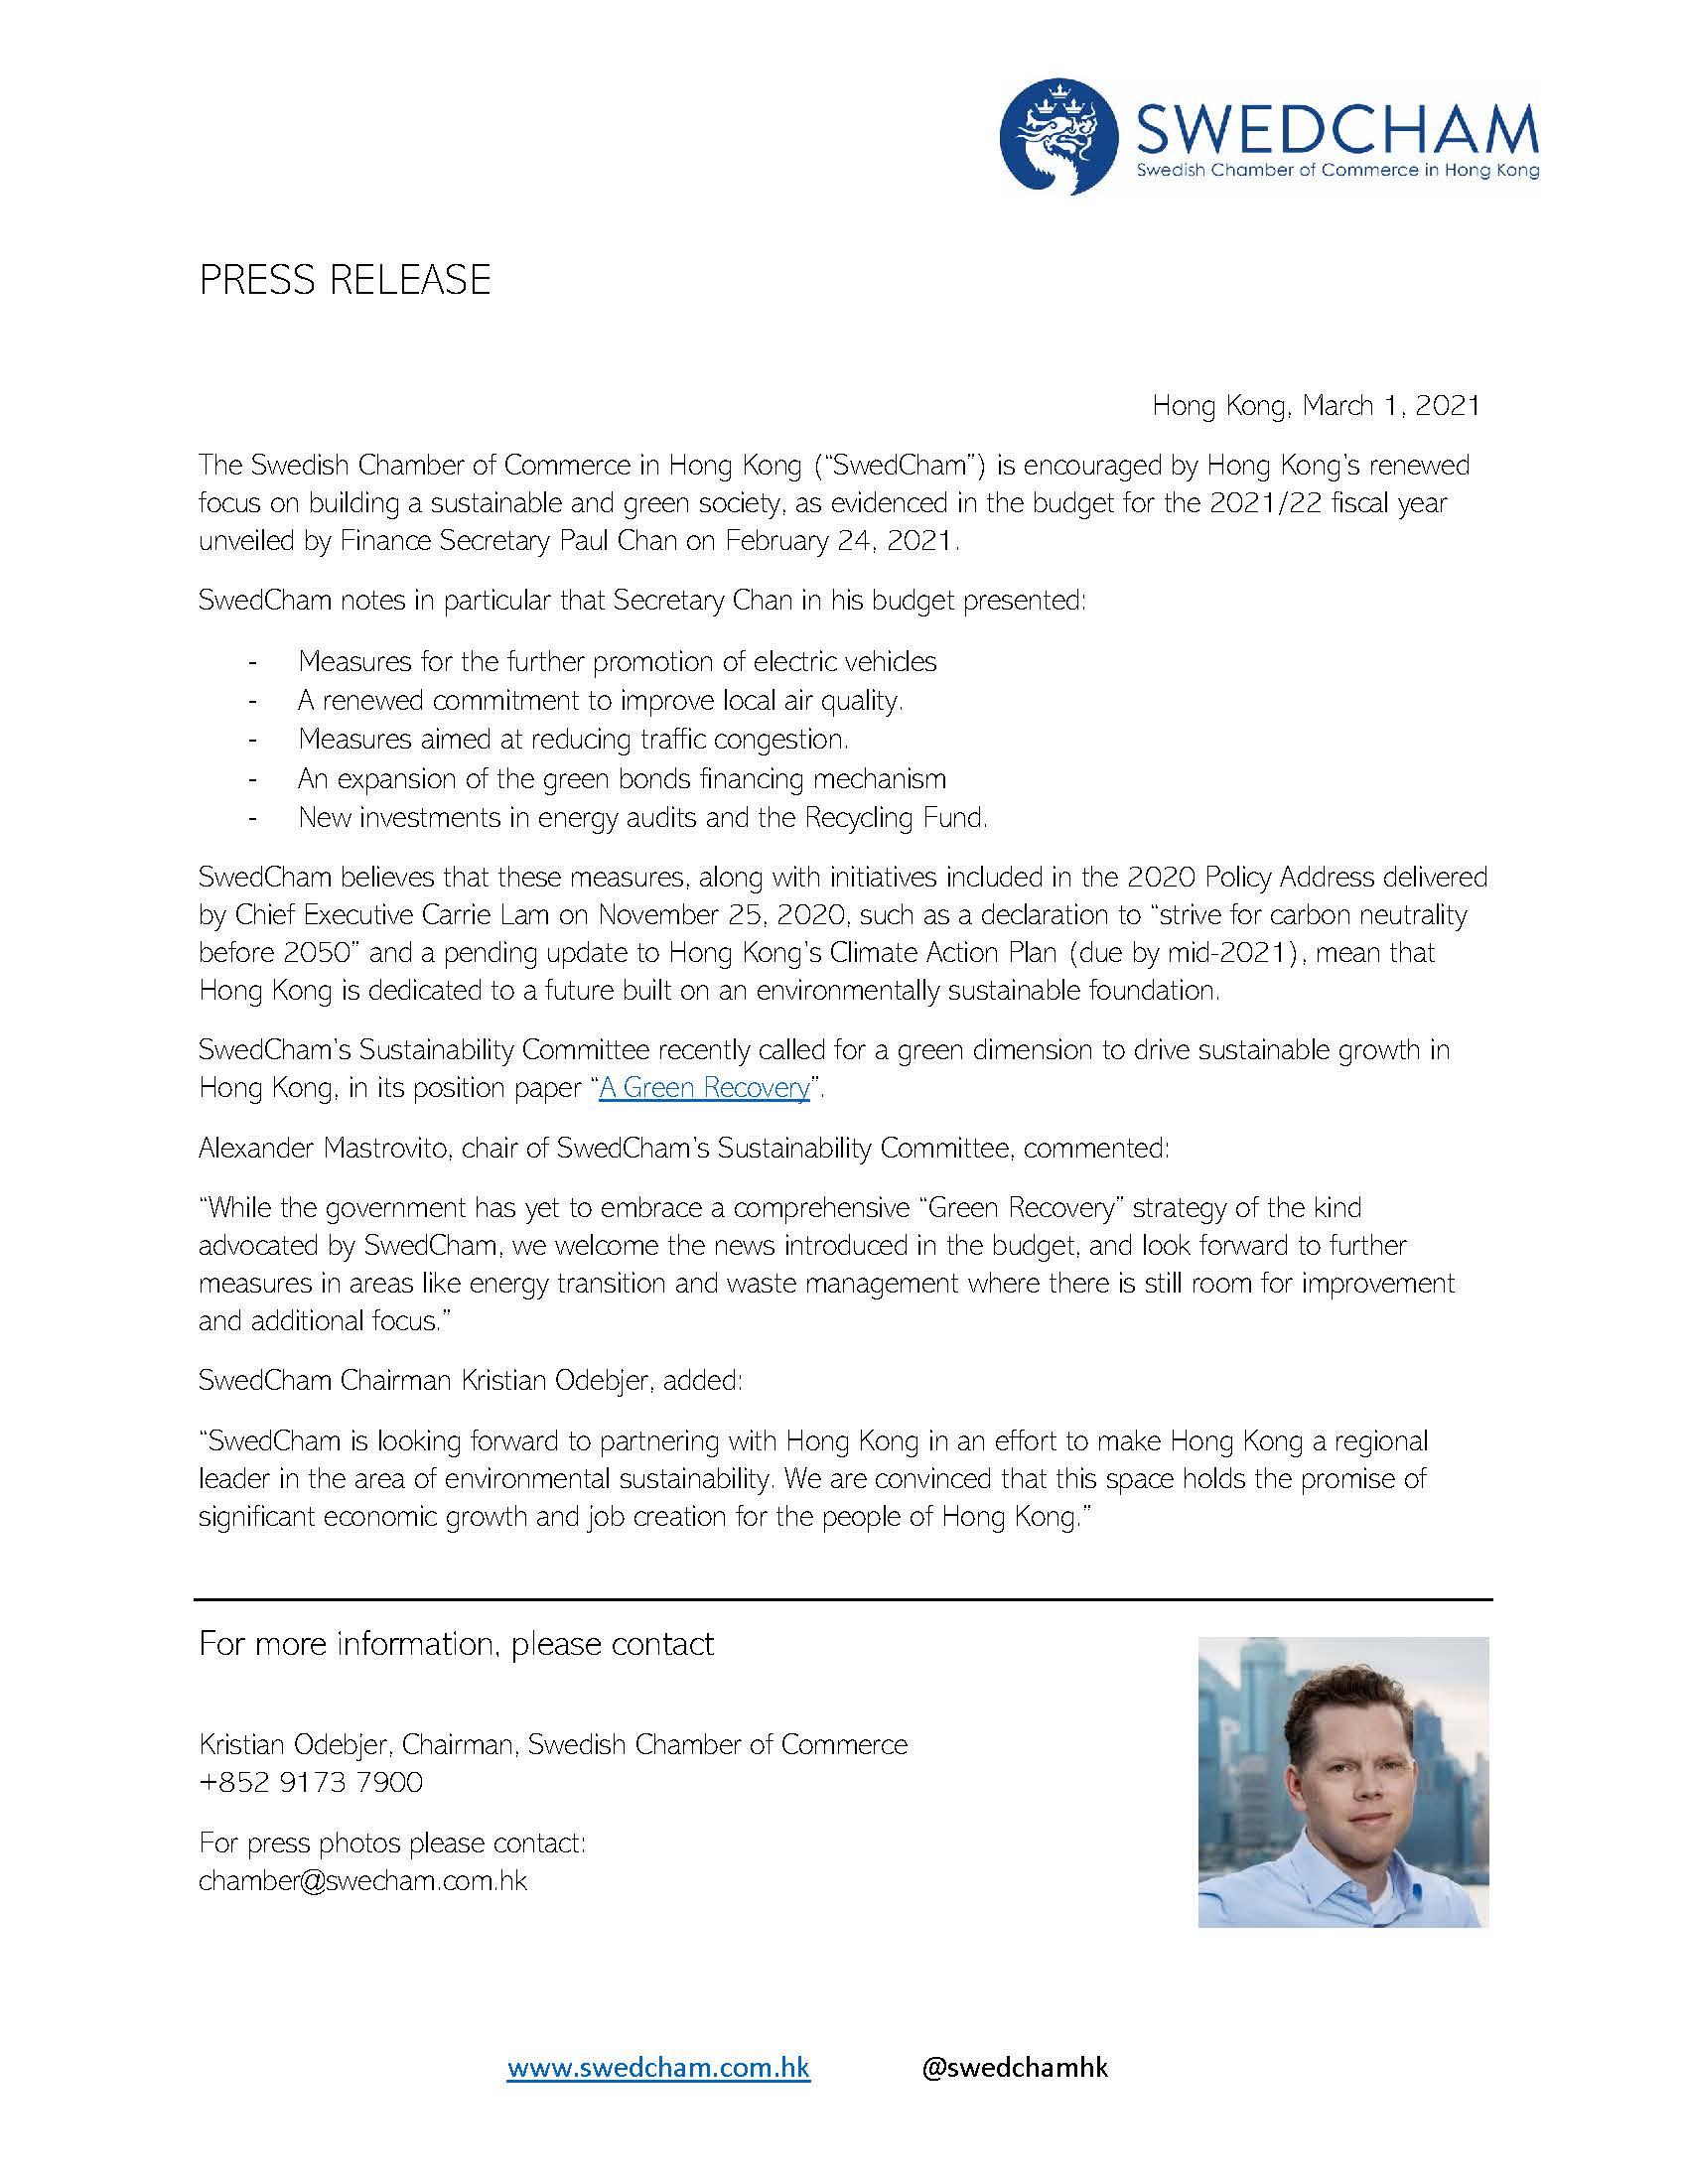 210301 PRESS RELEASE SwedCham Sust on HK budget